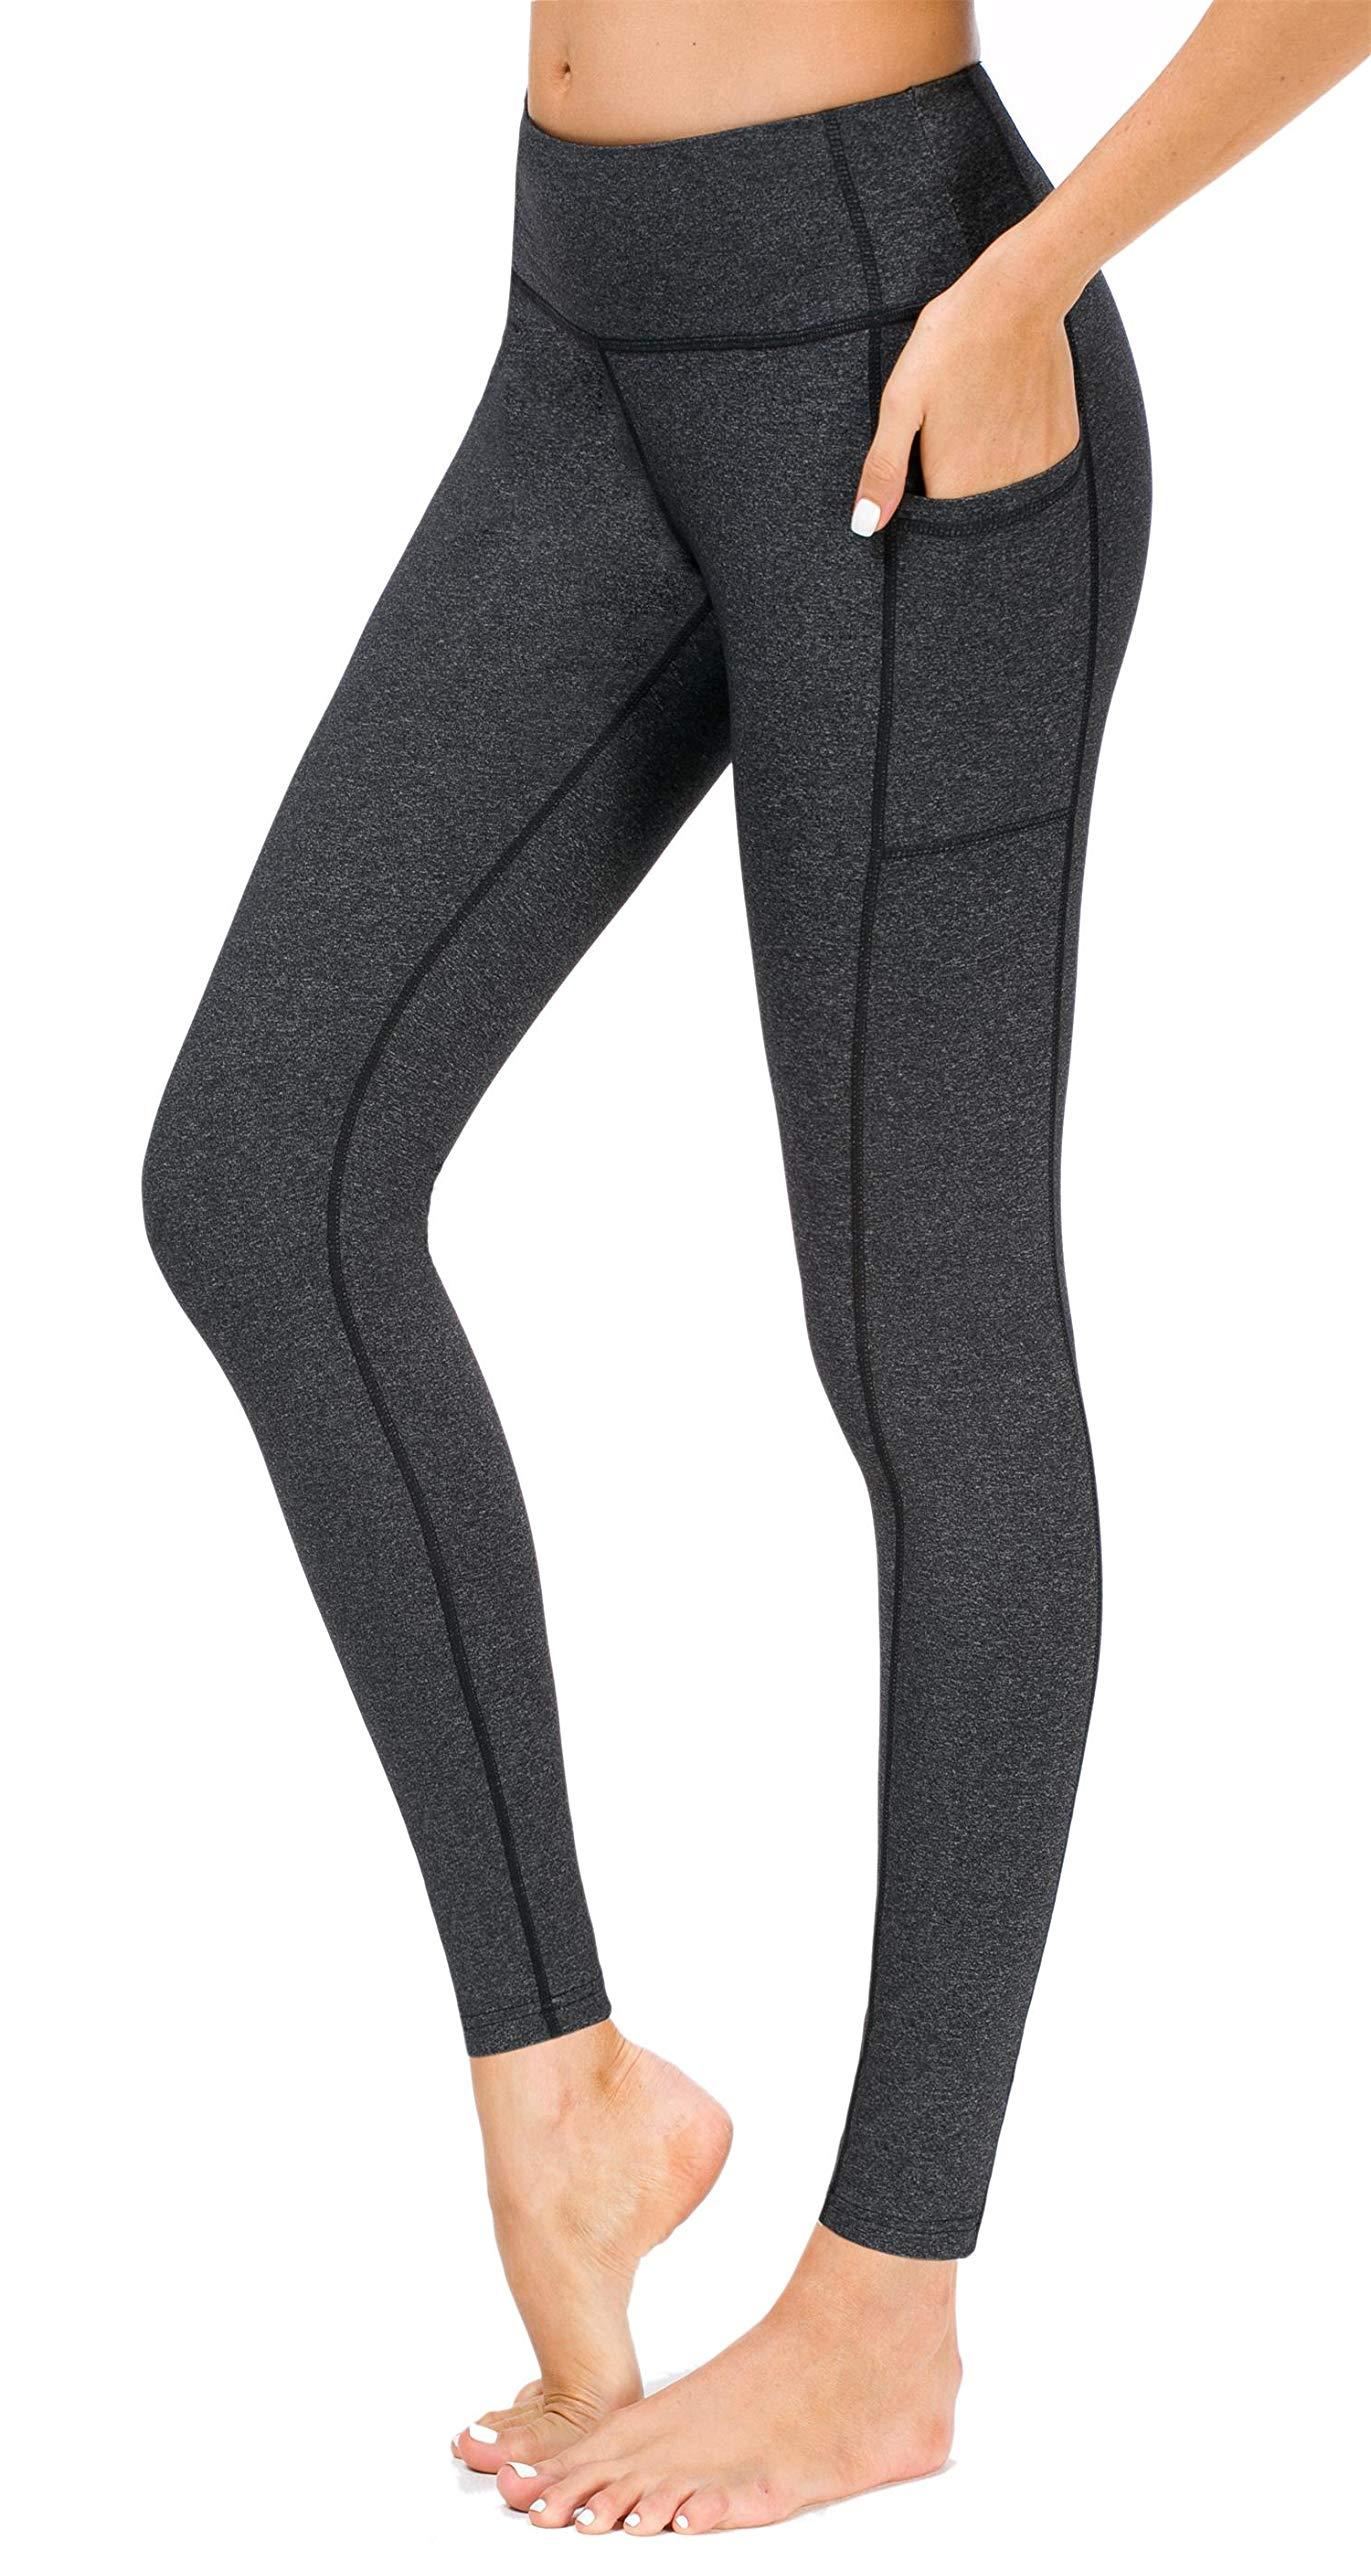 5df5bcc7da35f Sugar Pocket Women's Yoga Leggings Fitness Tights Workout Pants Gym Leggings  with Side Pocket product image